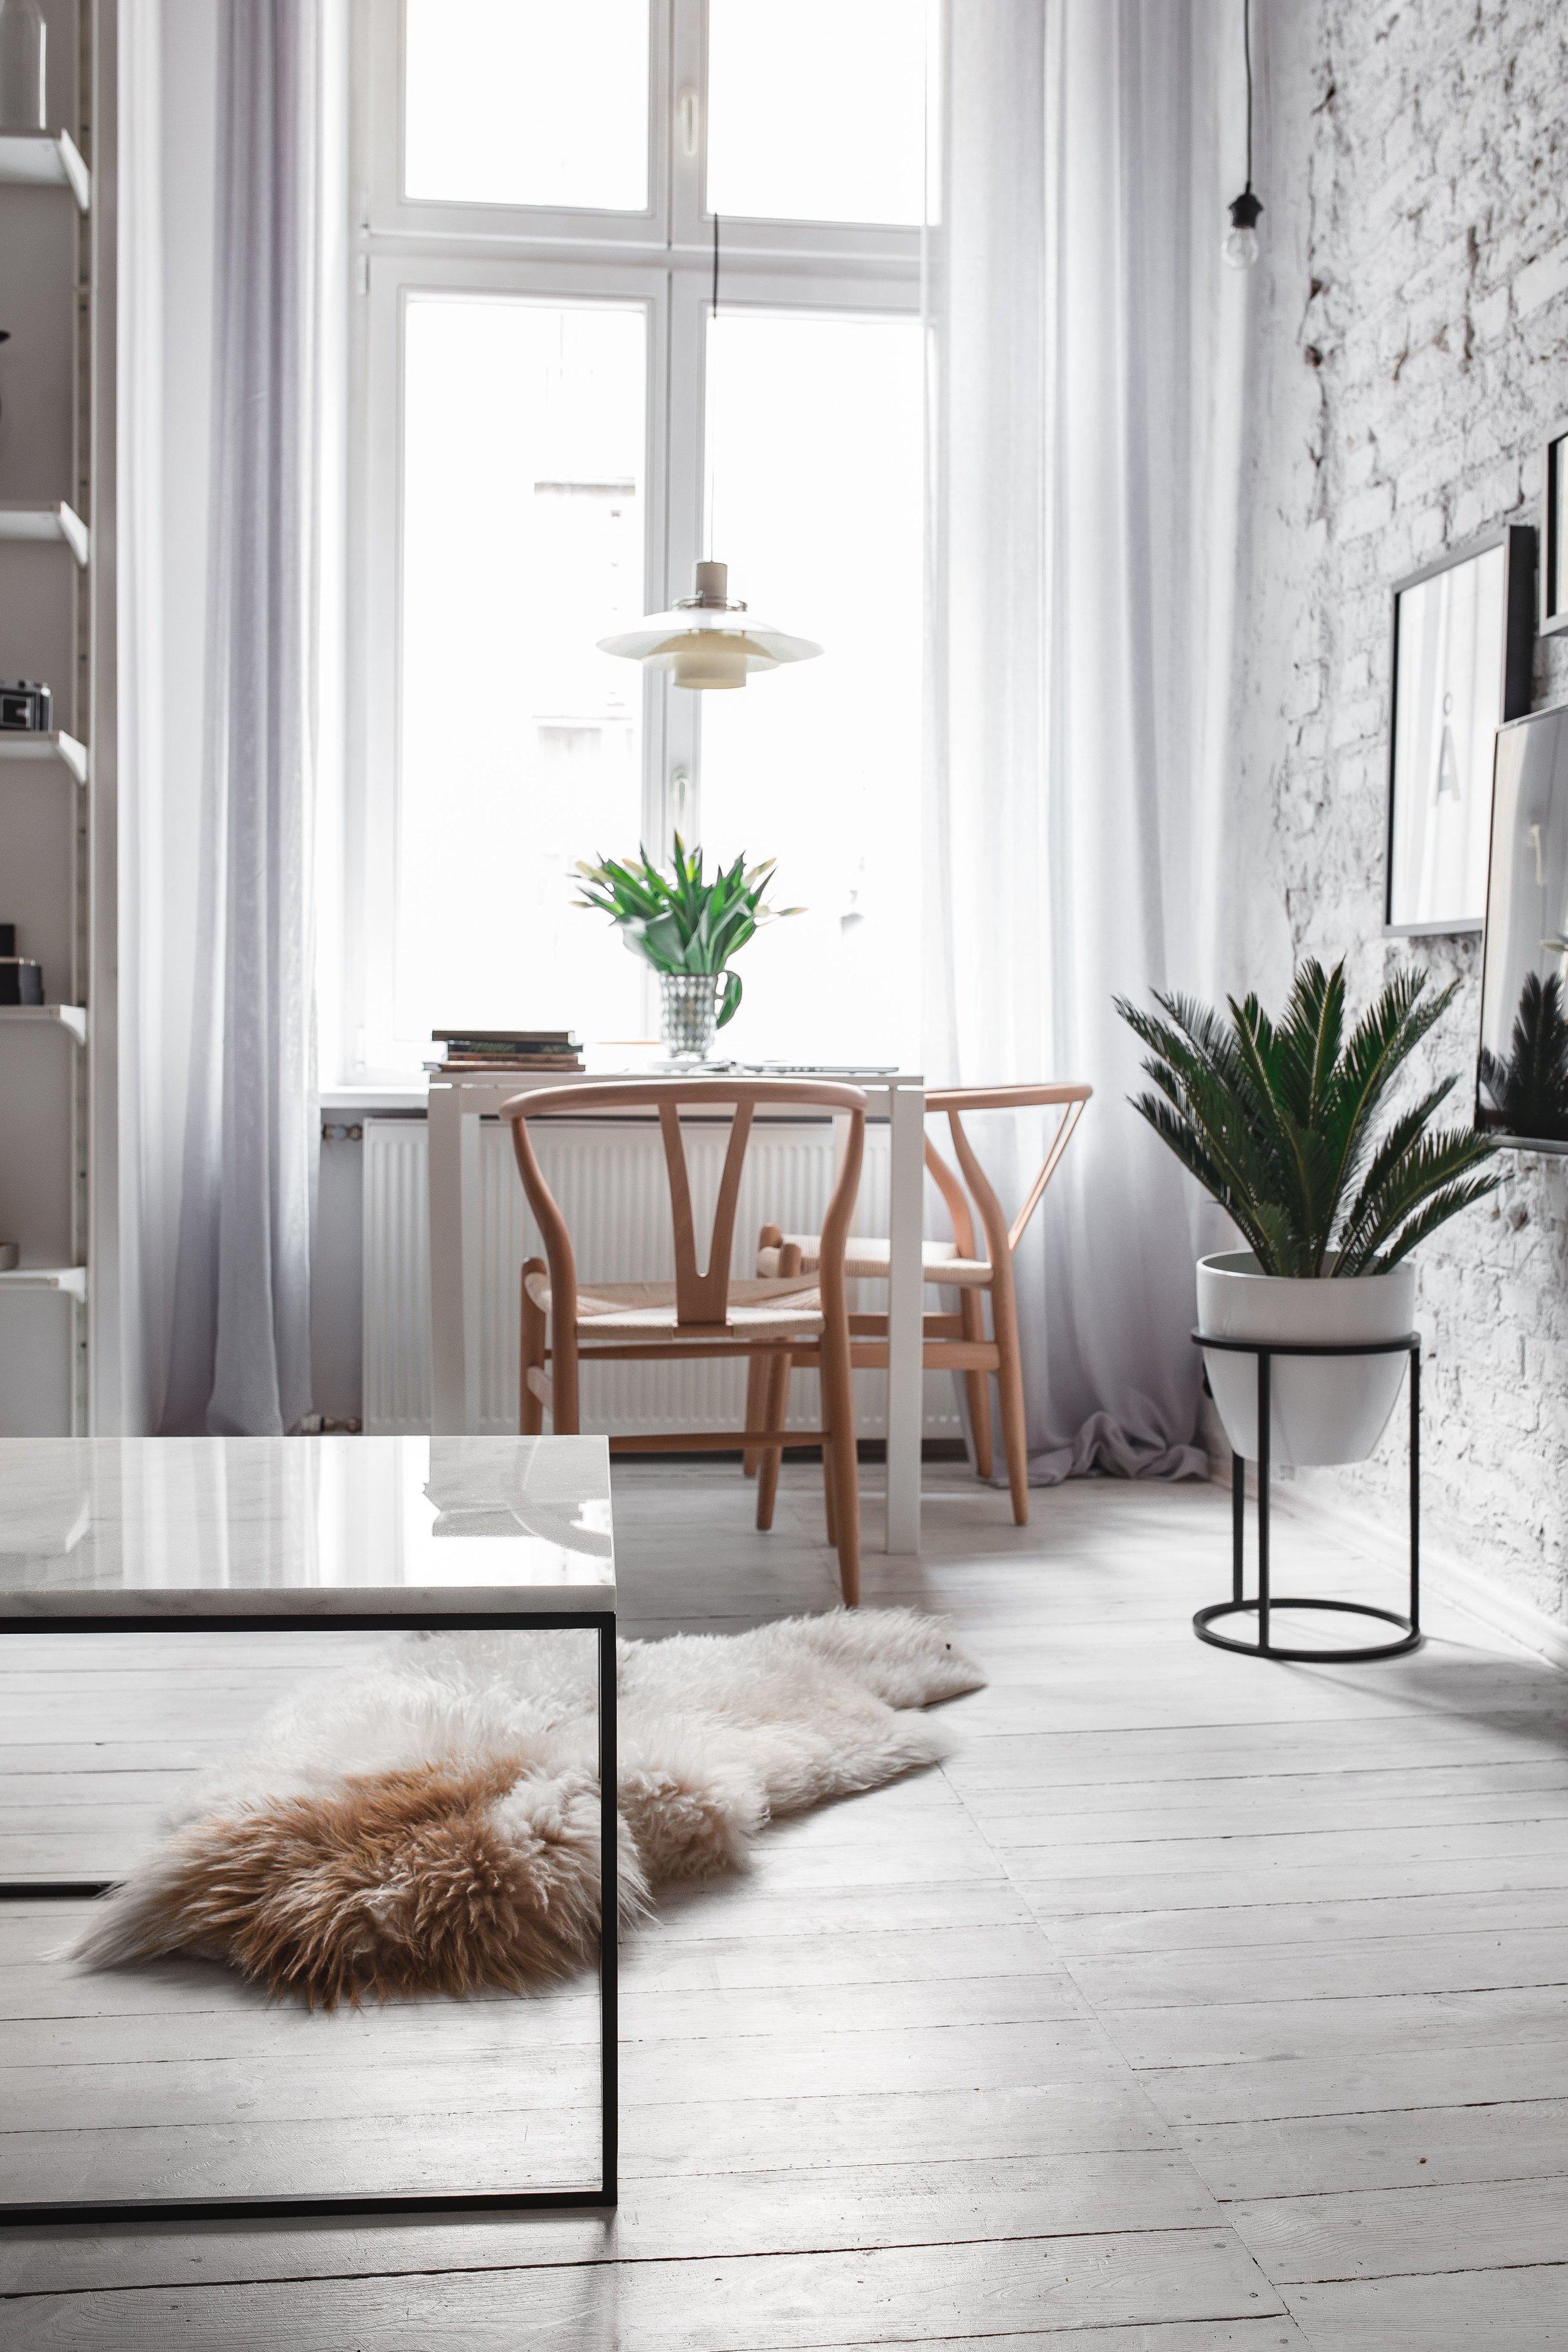 kaboompics_White Living Room With Minimalist Scandinavian Interior Design, Un'common Marble Table.jpg